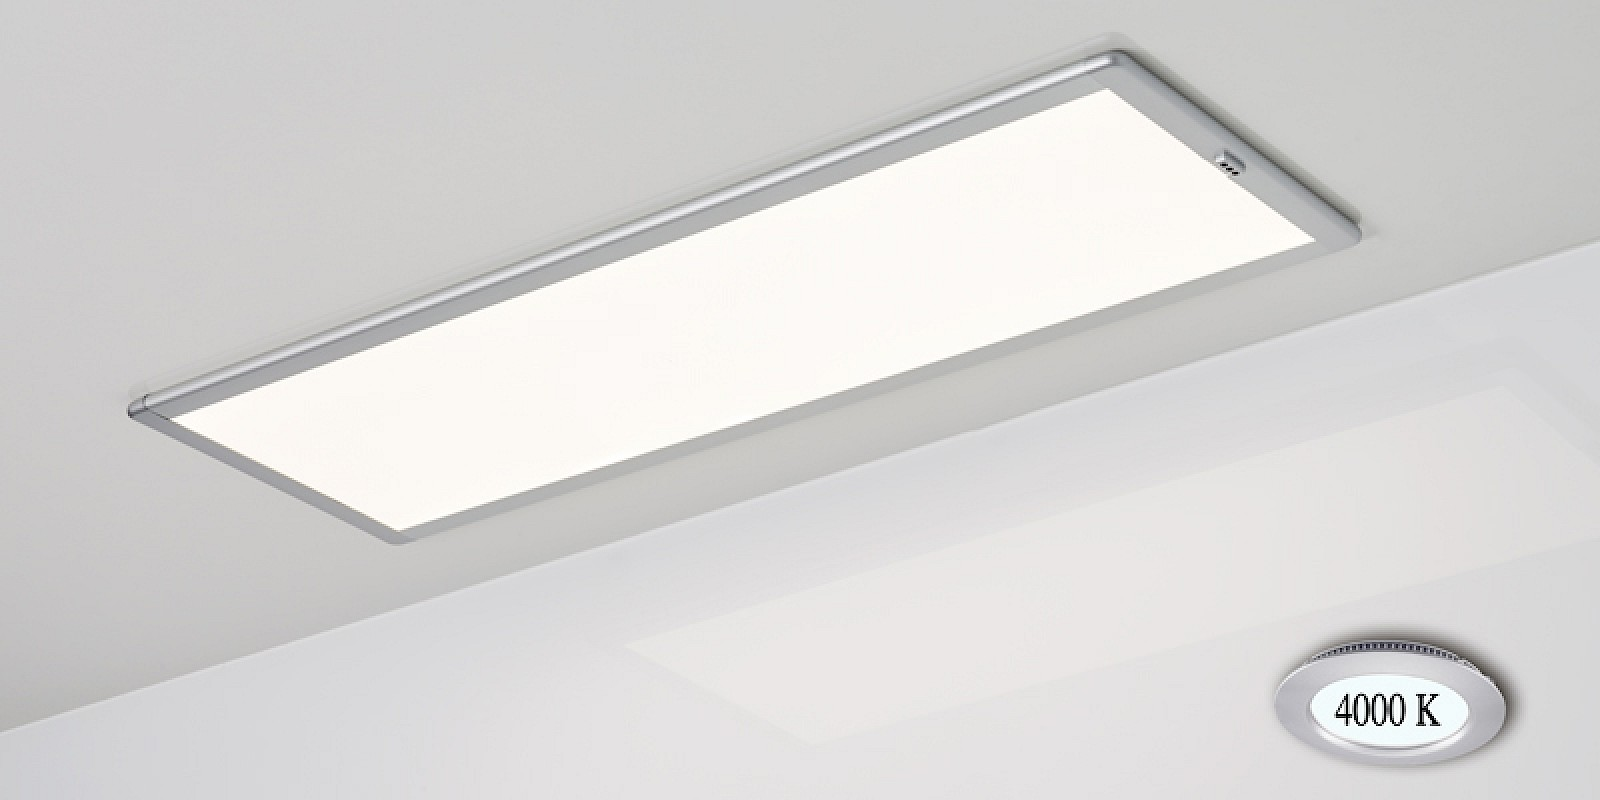 osram led tubekit 2ft unterschrankleuchte wei direkanschluss mit kabel energieklasse a. Black Bedroom Furniture Sets. Home Design Ideas